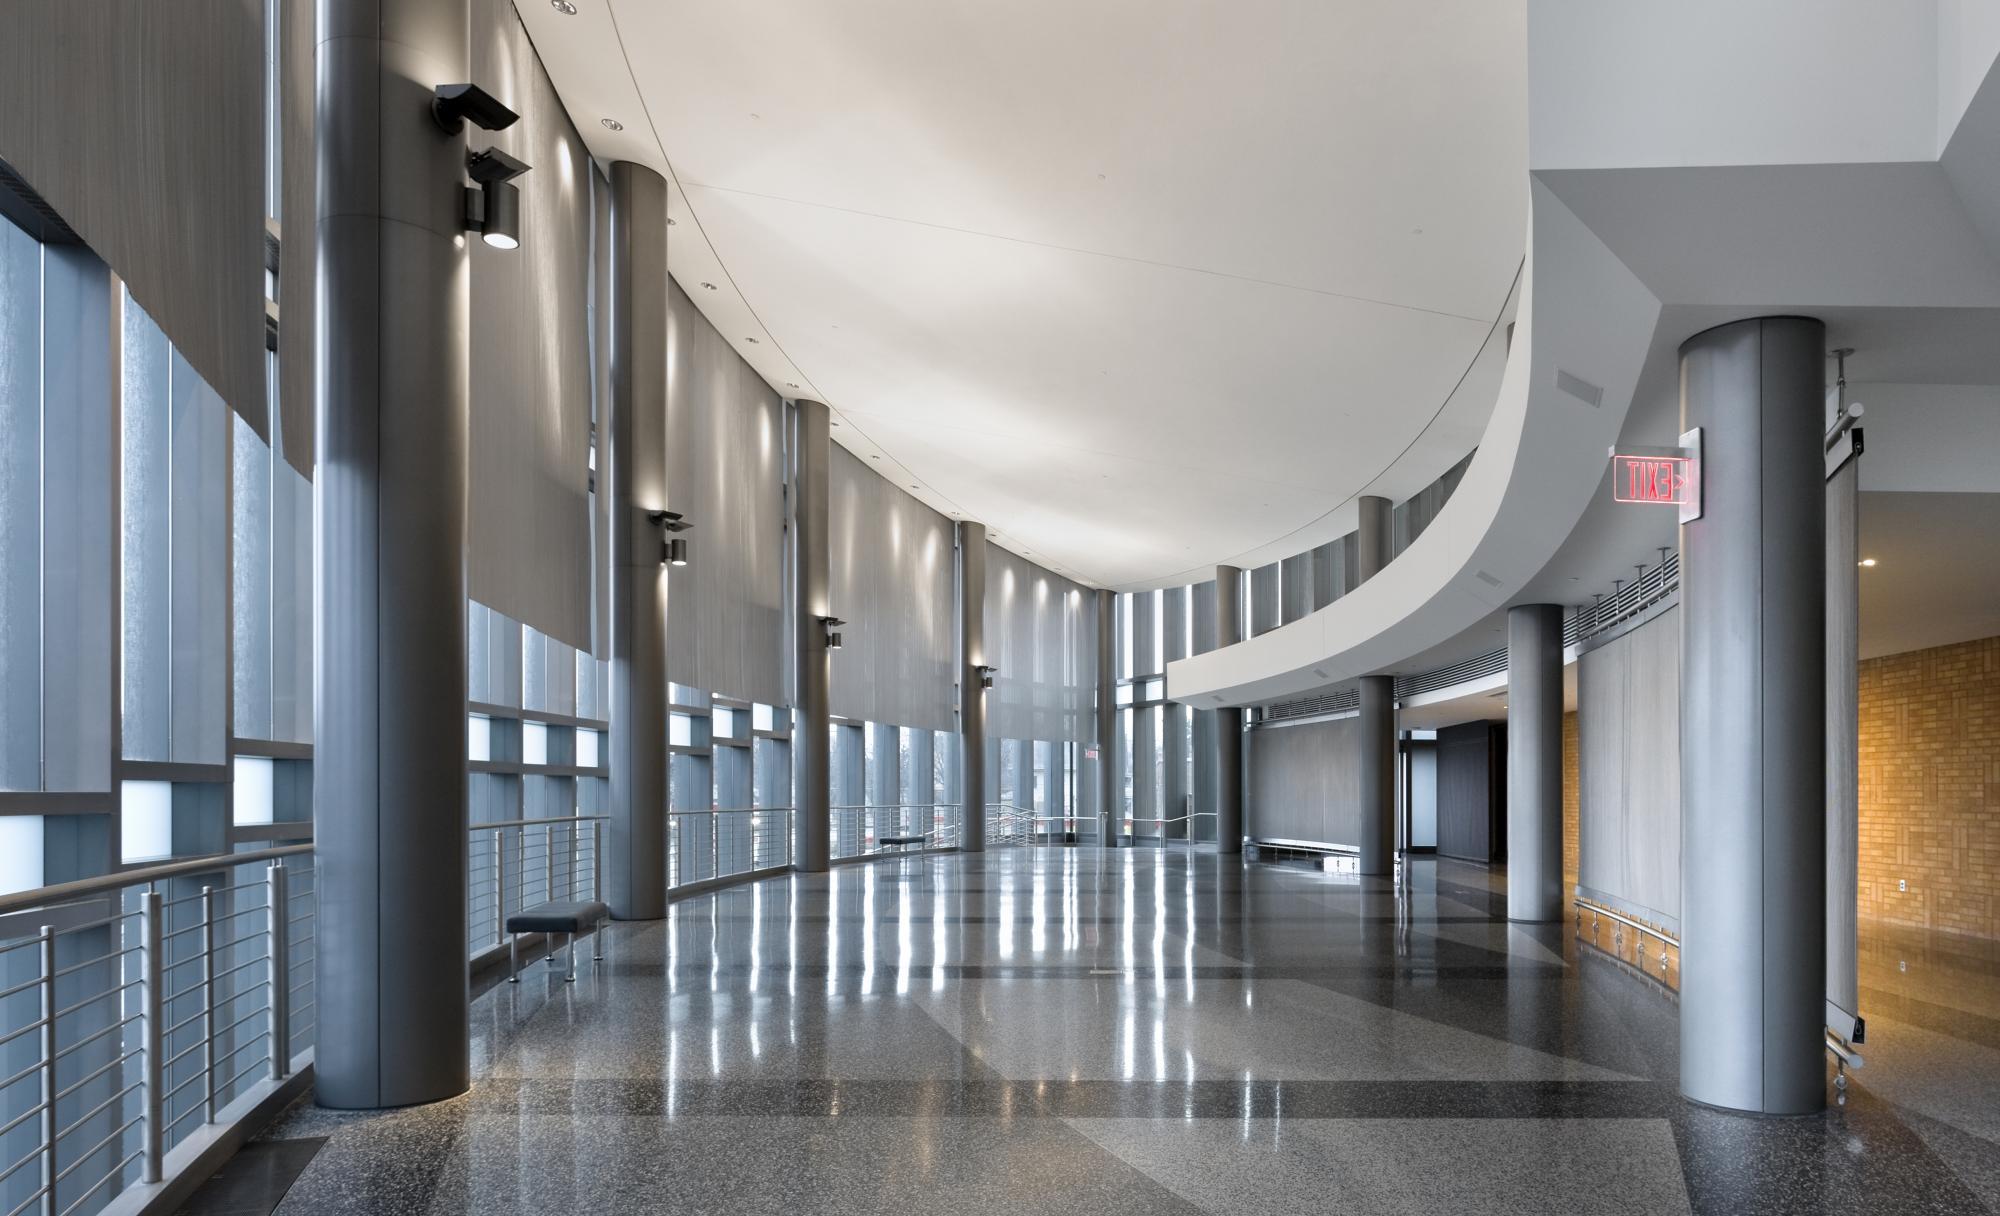 Facility Rental Promo Image